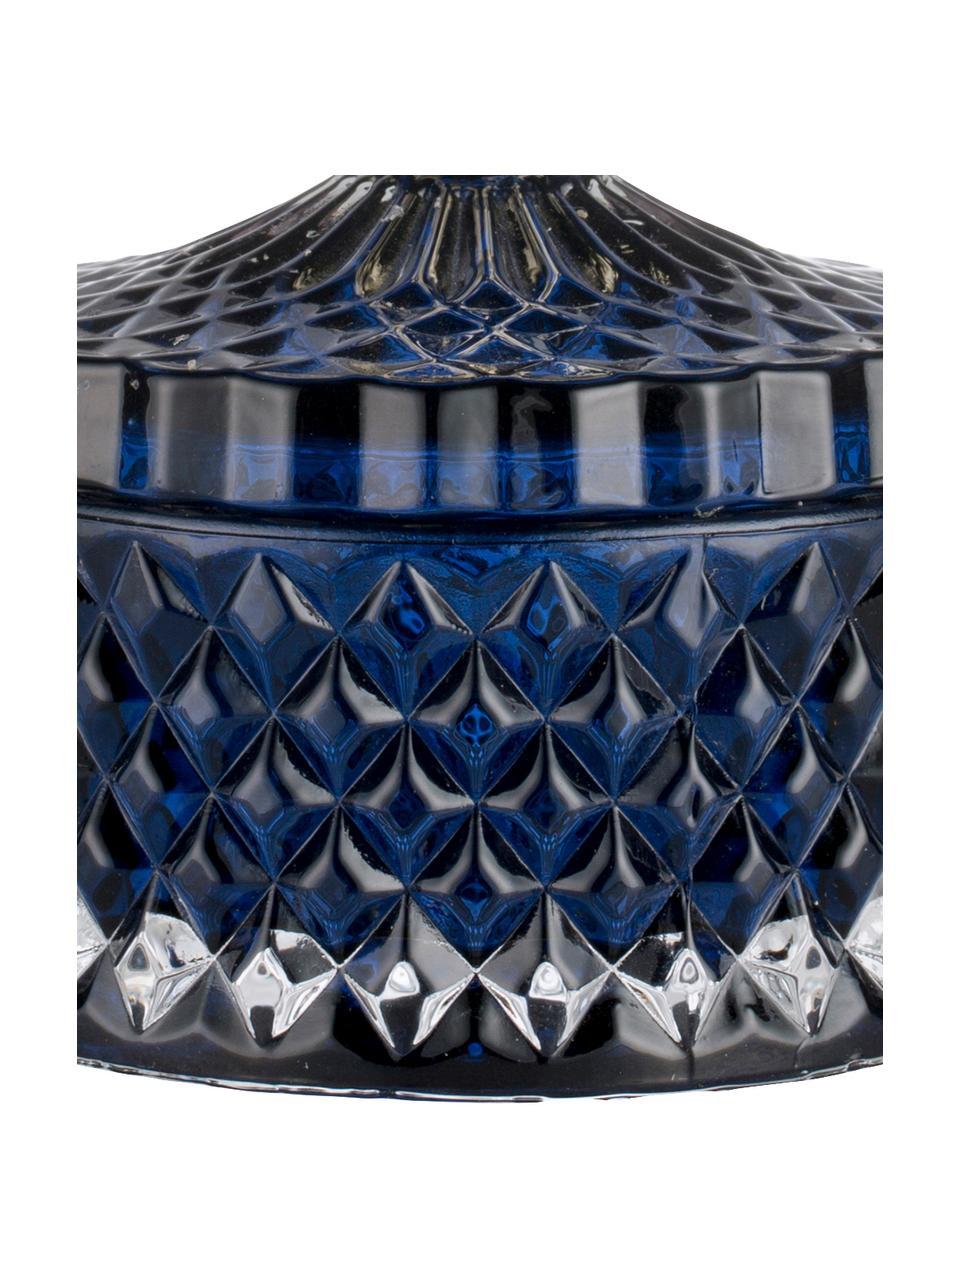 Aufbewahrungsdose Miya, Glas, Blau, Goldfarben, Ø 9 x H 11 cm